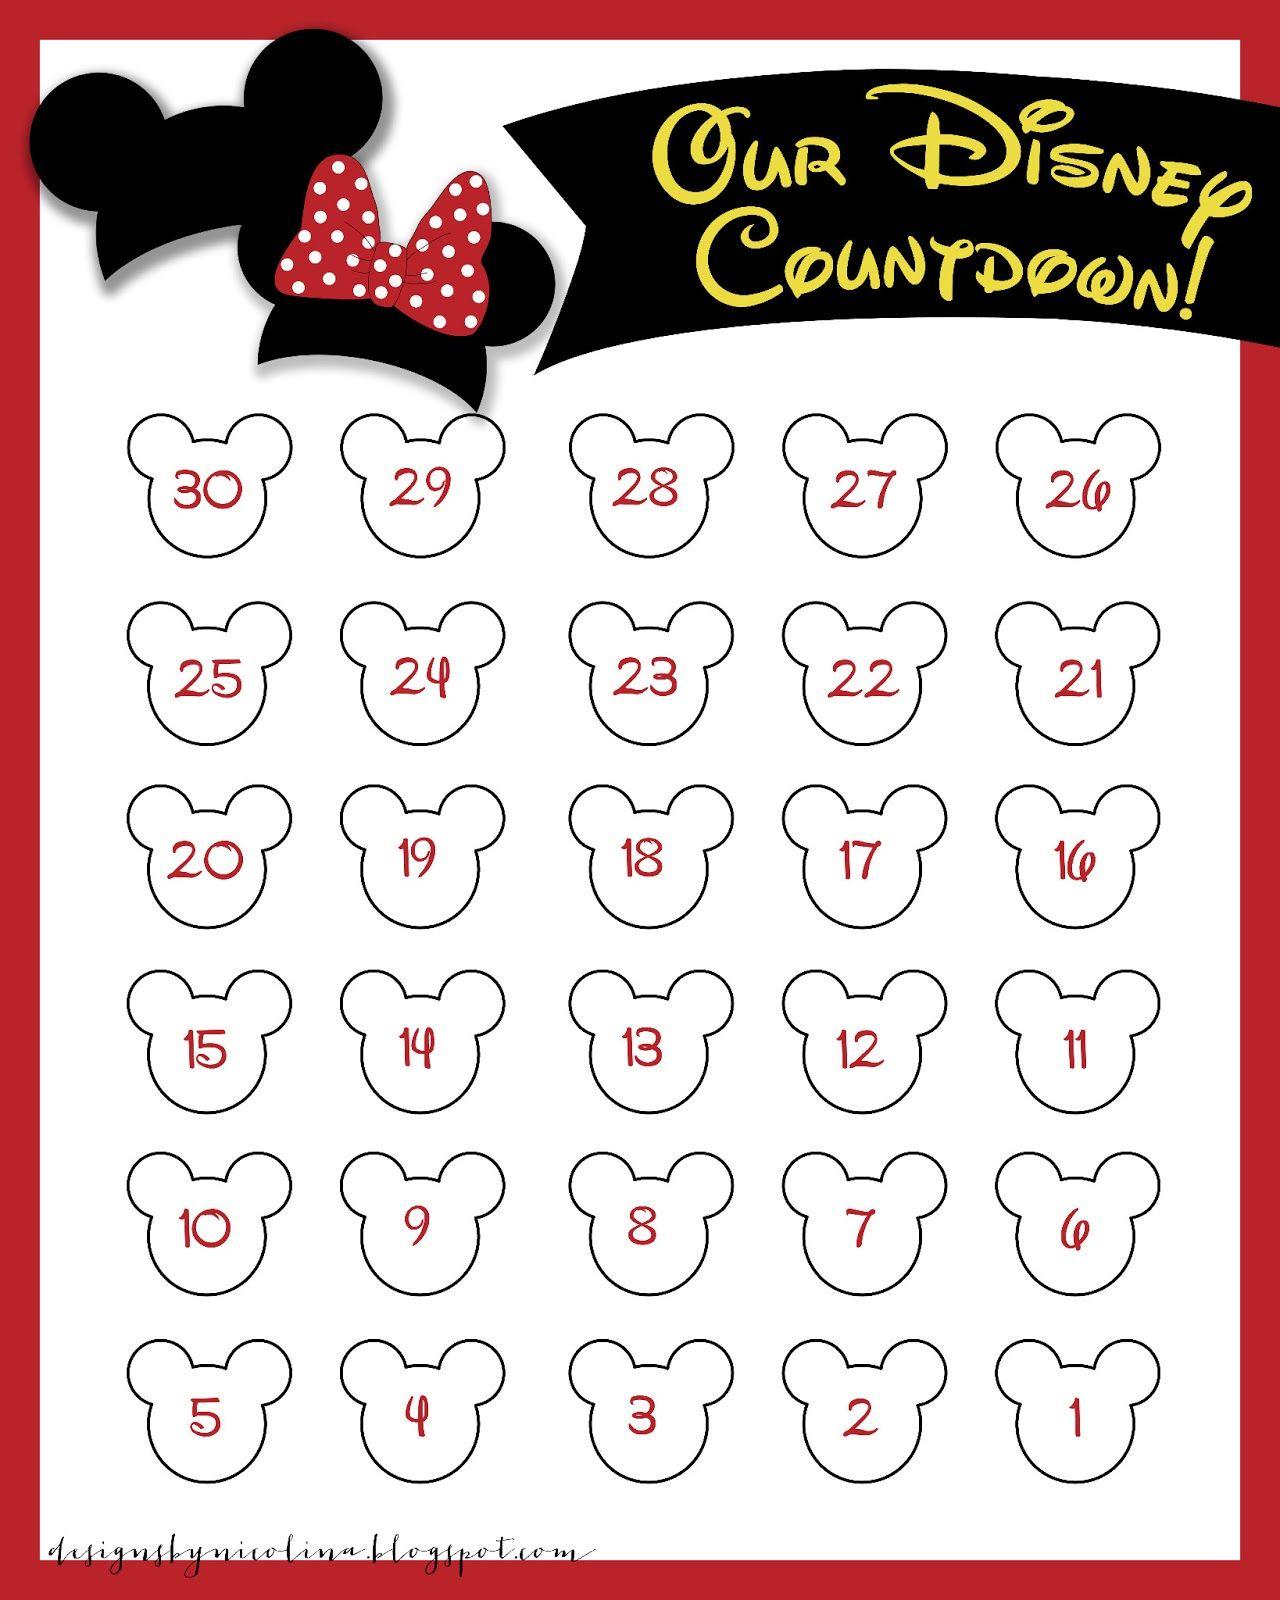 Disneyland Countdown Calendar | Designsnicolina: Disney